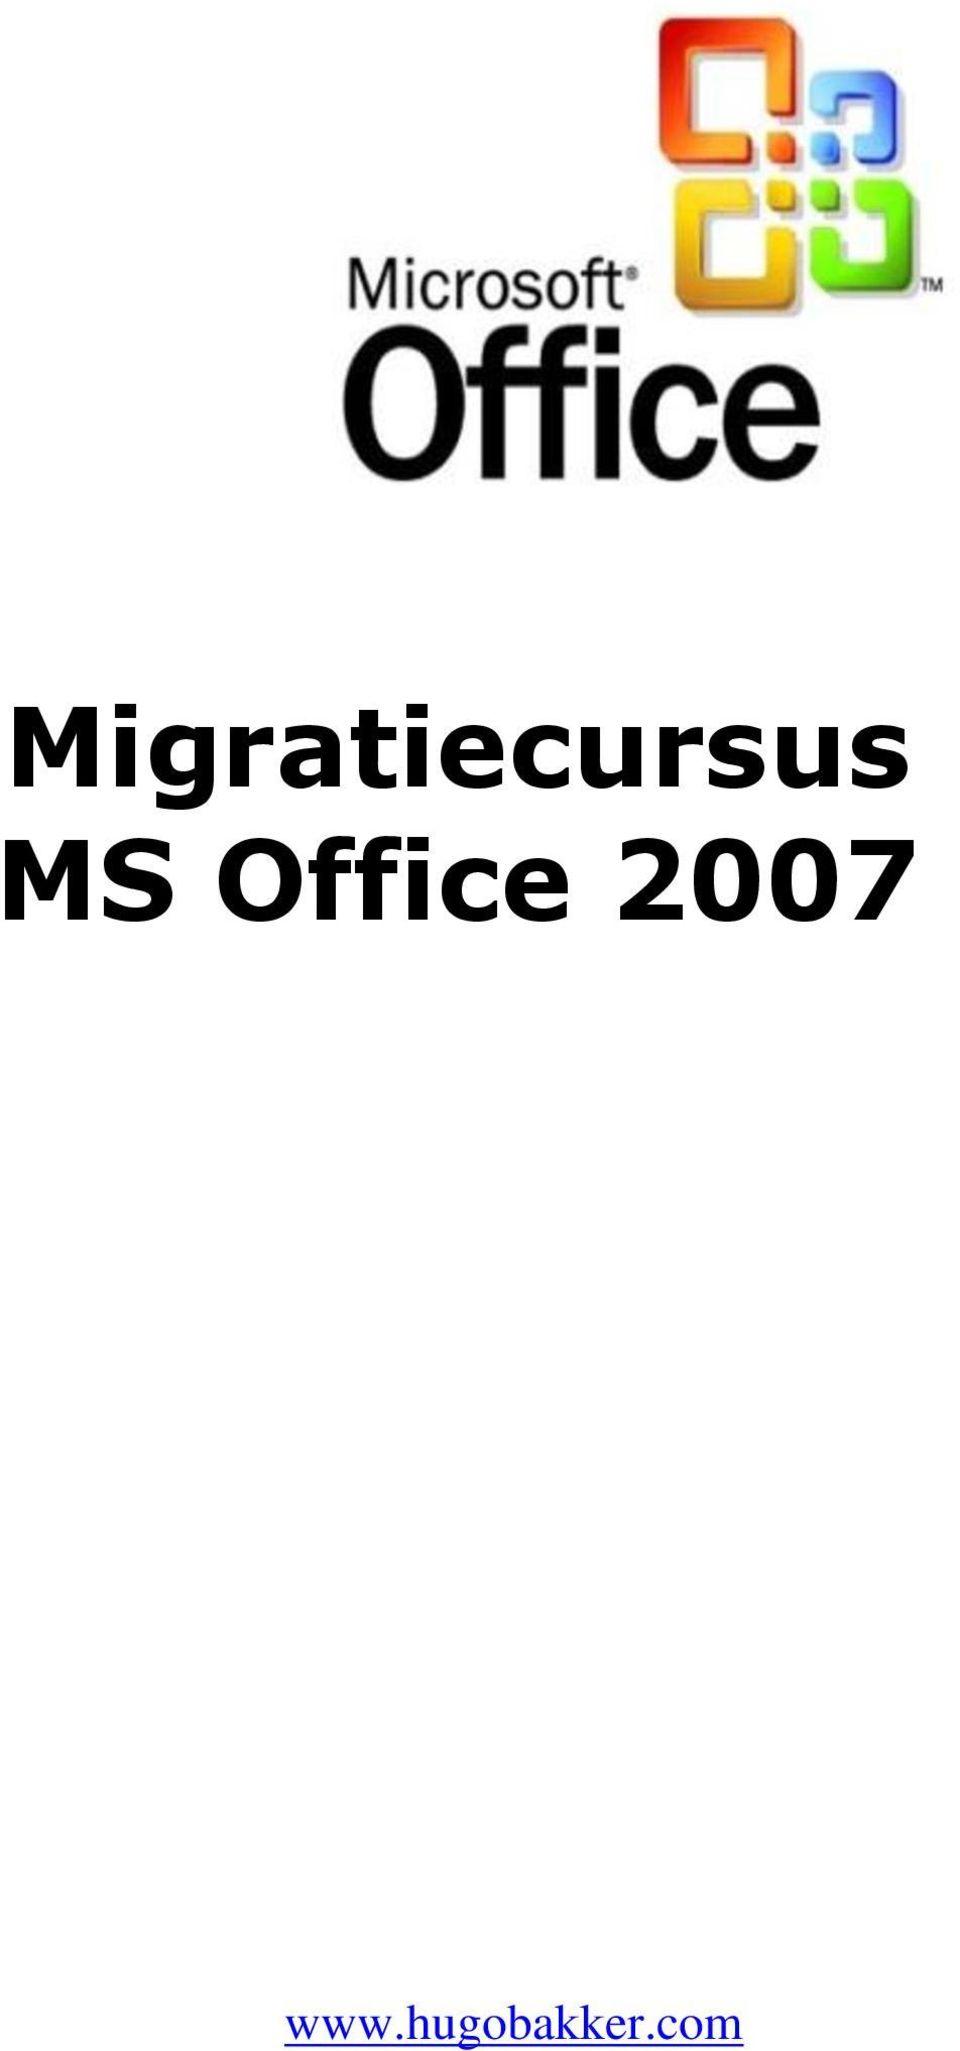 Migratiecursus MS Office PDF